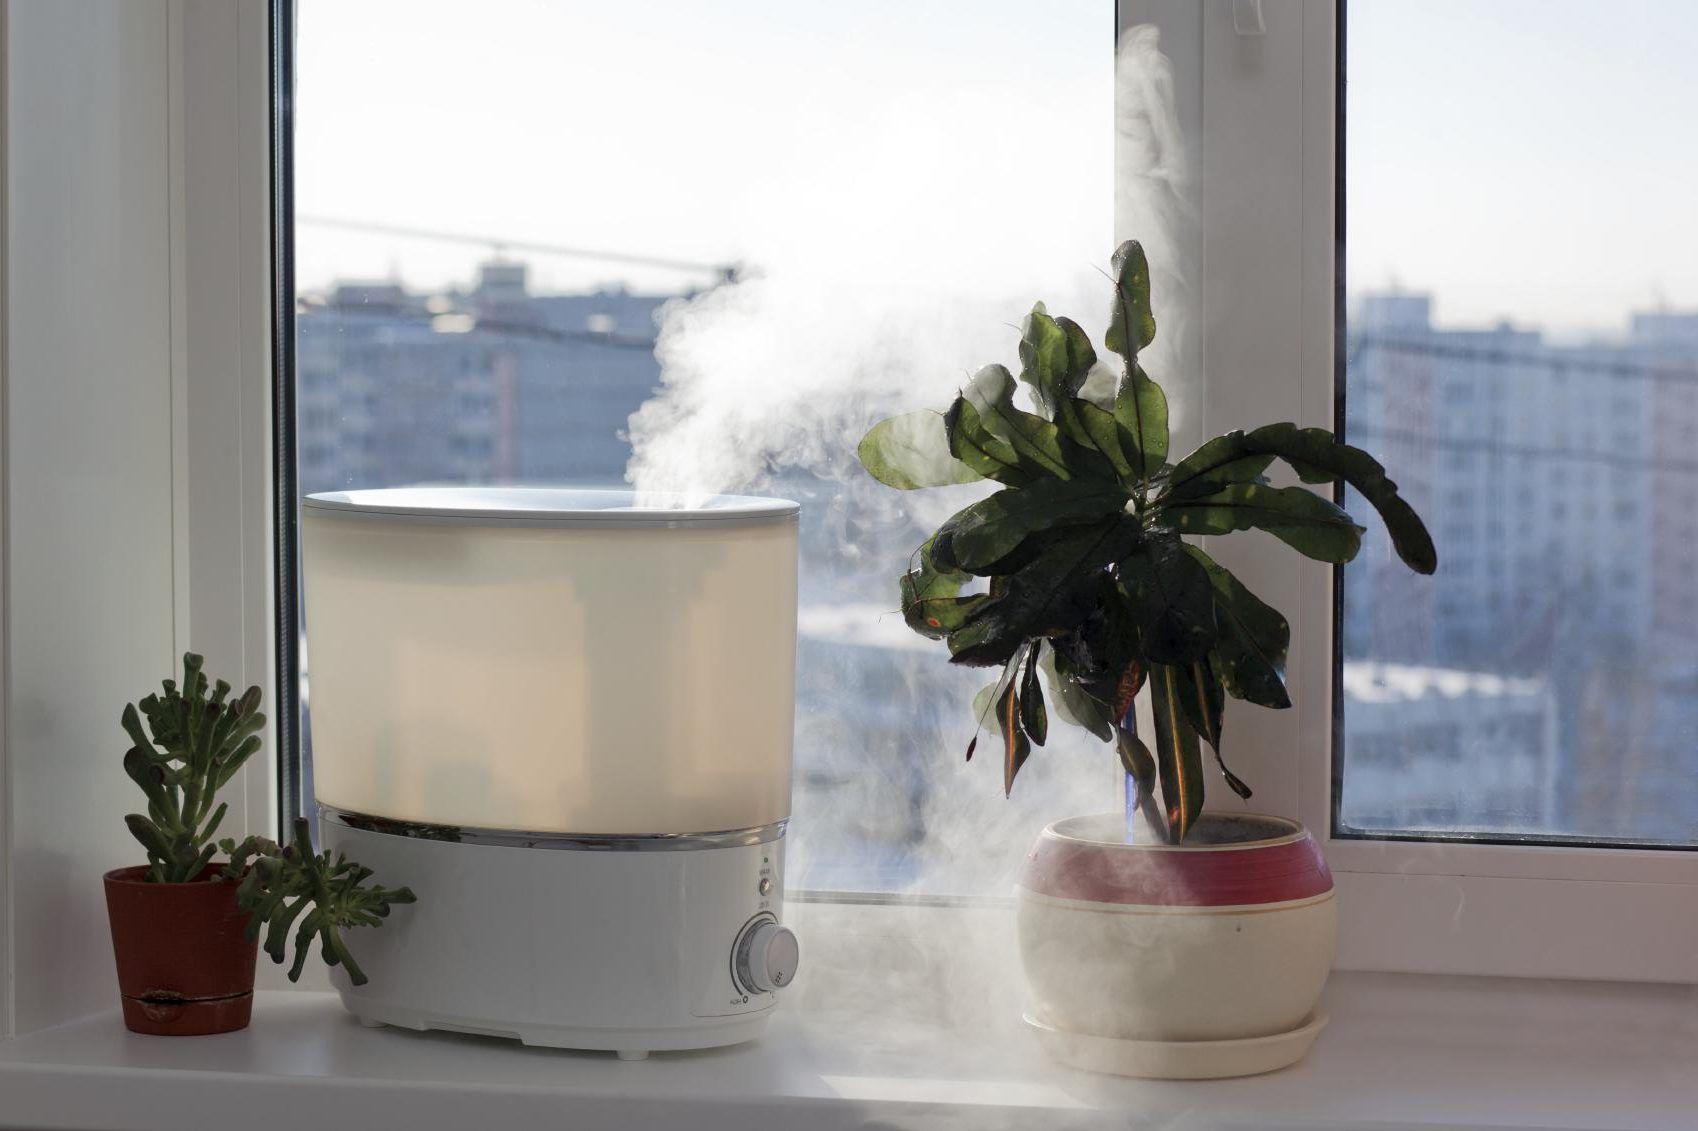 свежий Воздух для растений